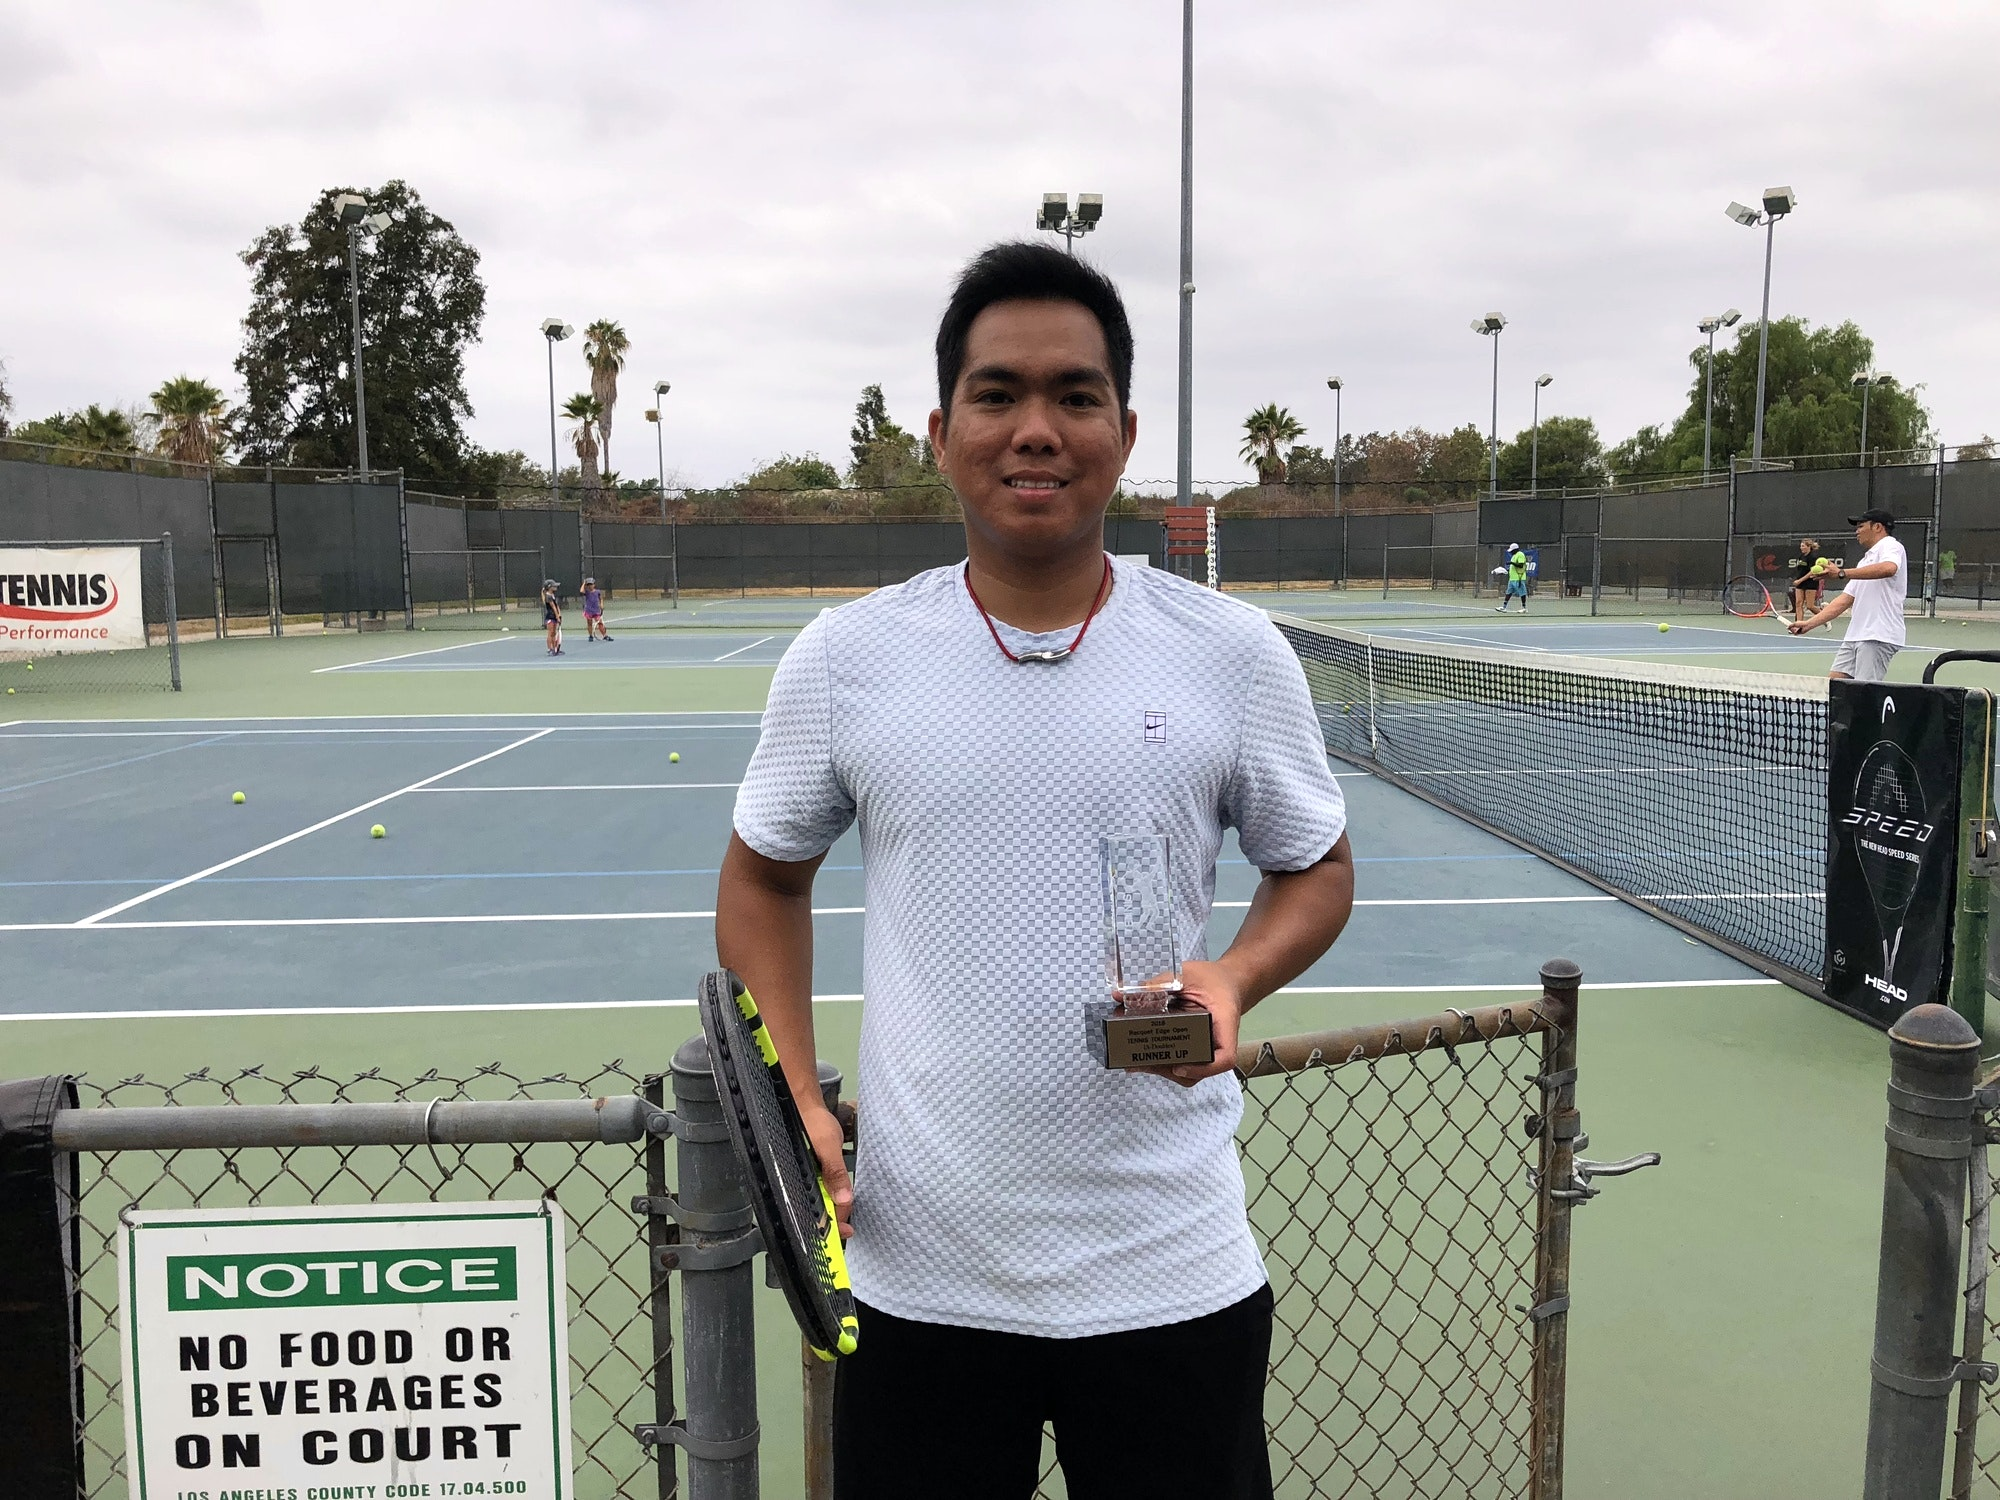 John teaches tennis lessons in Glendora, CA